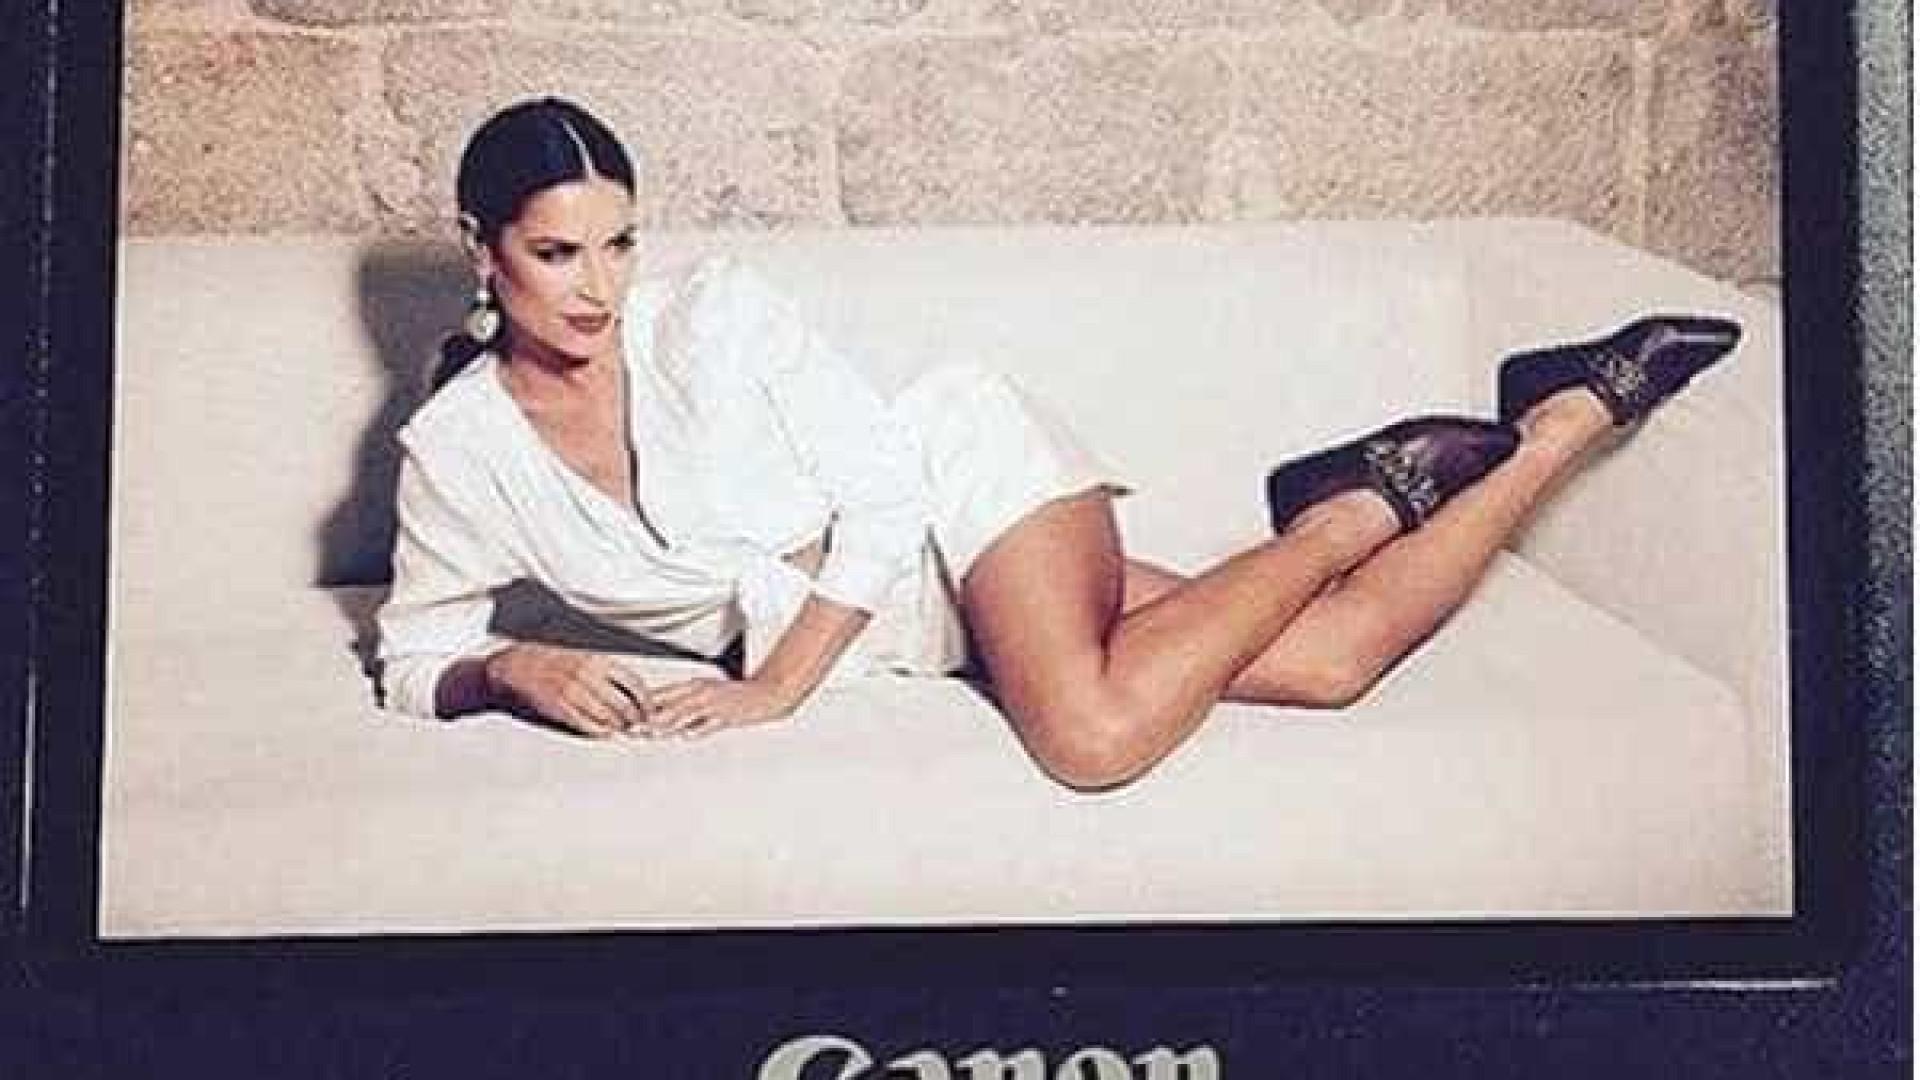 Erotica Dania Neto nudes (87 photos), Sexy, Sideboobs, Twitter, cleavage 2006